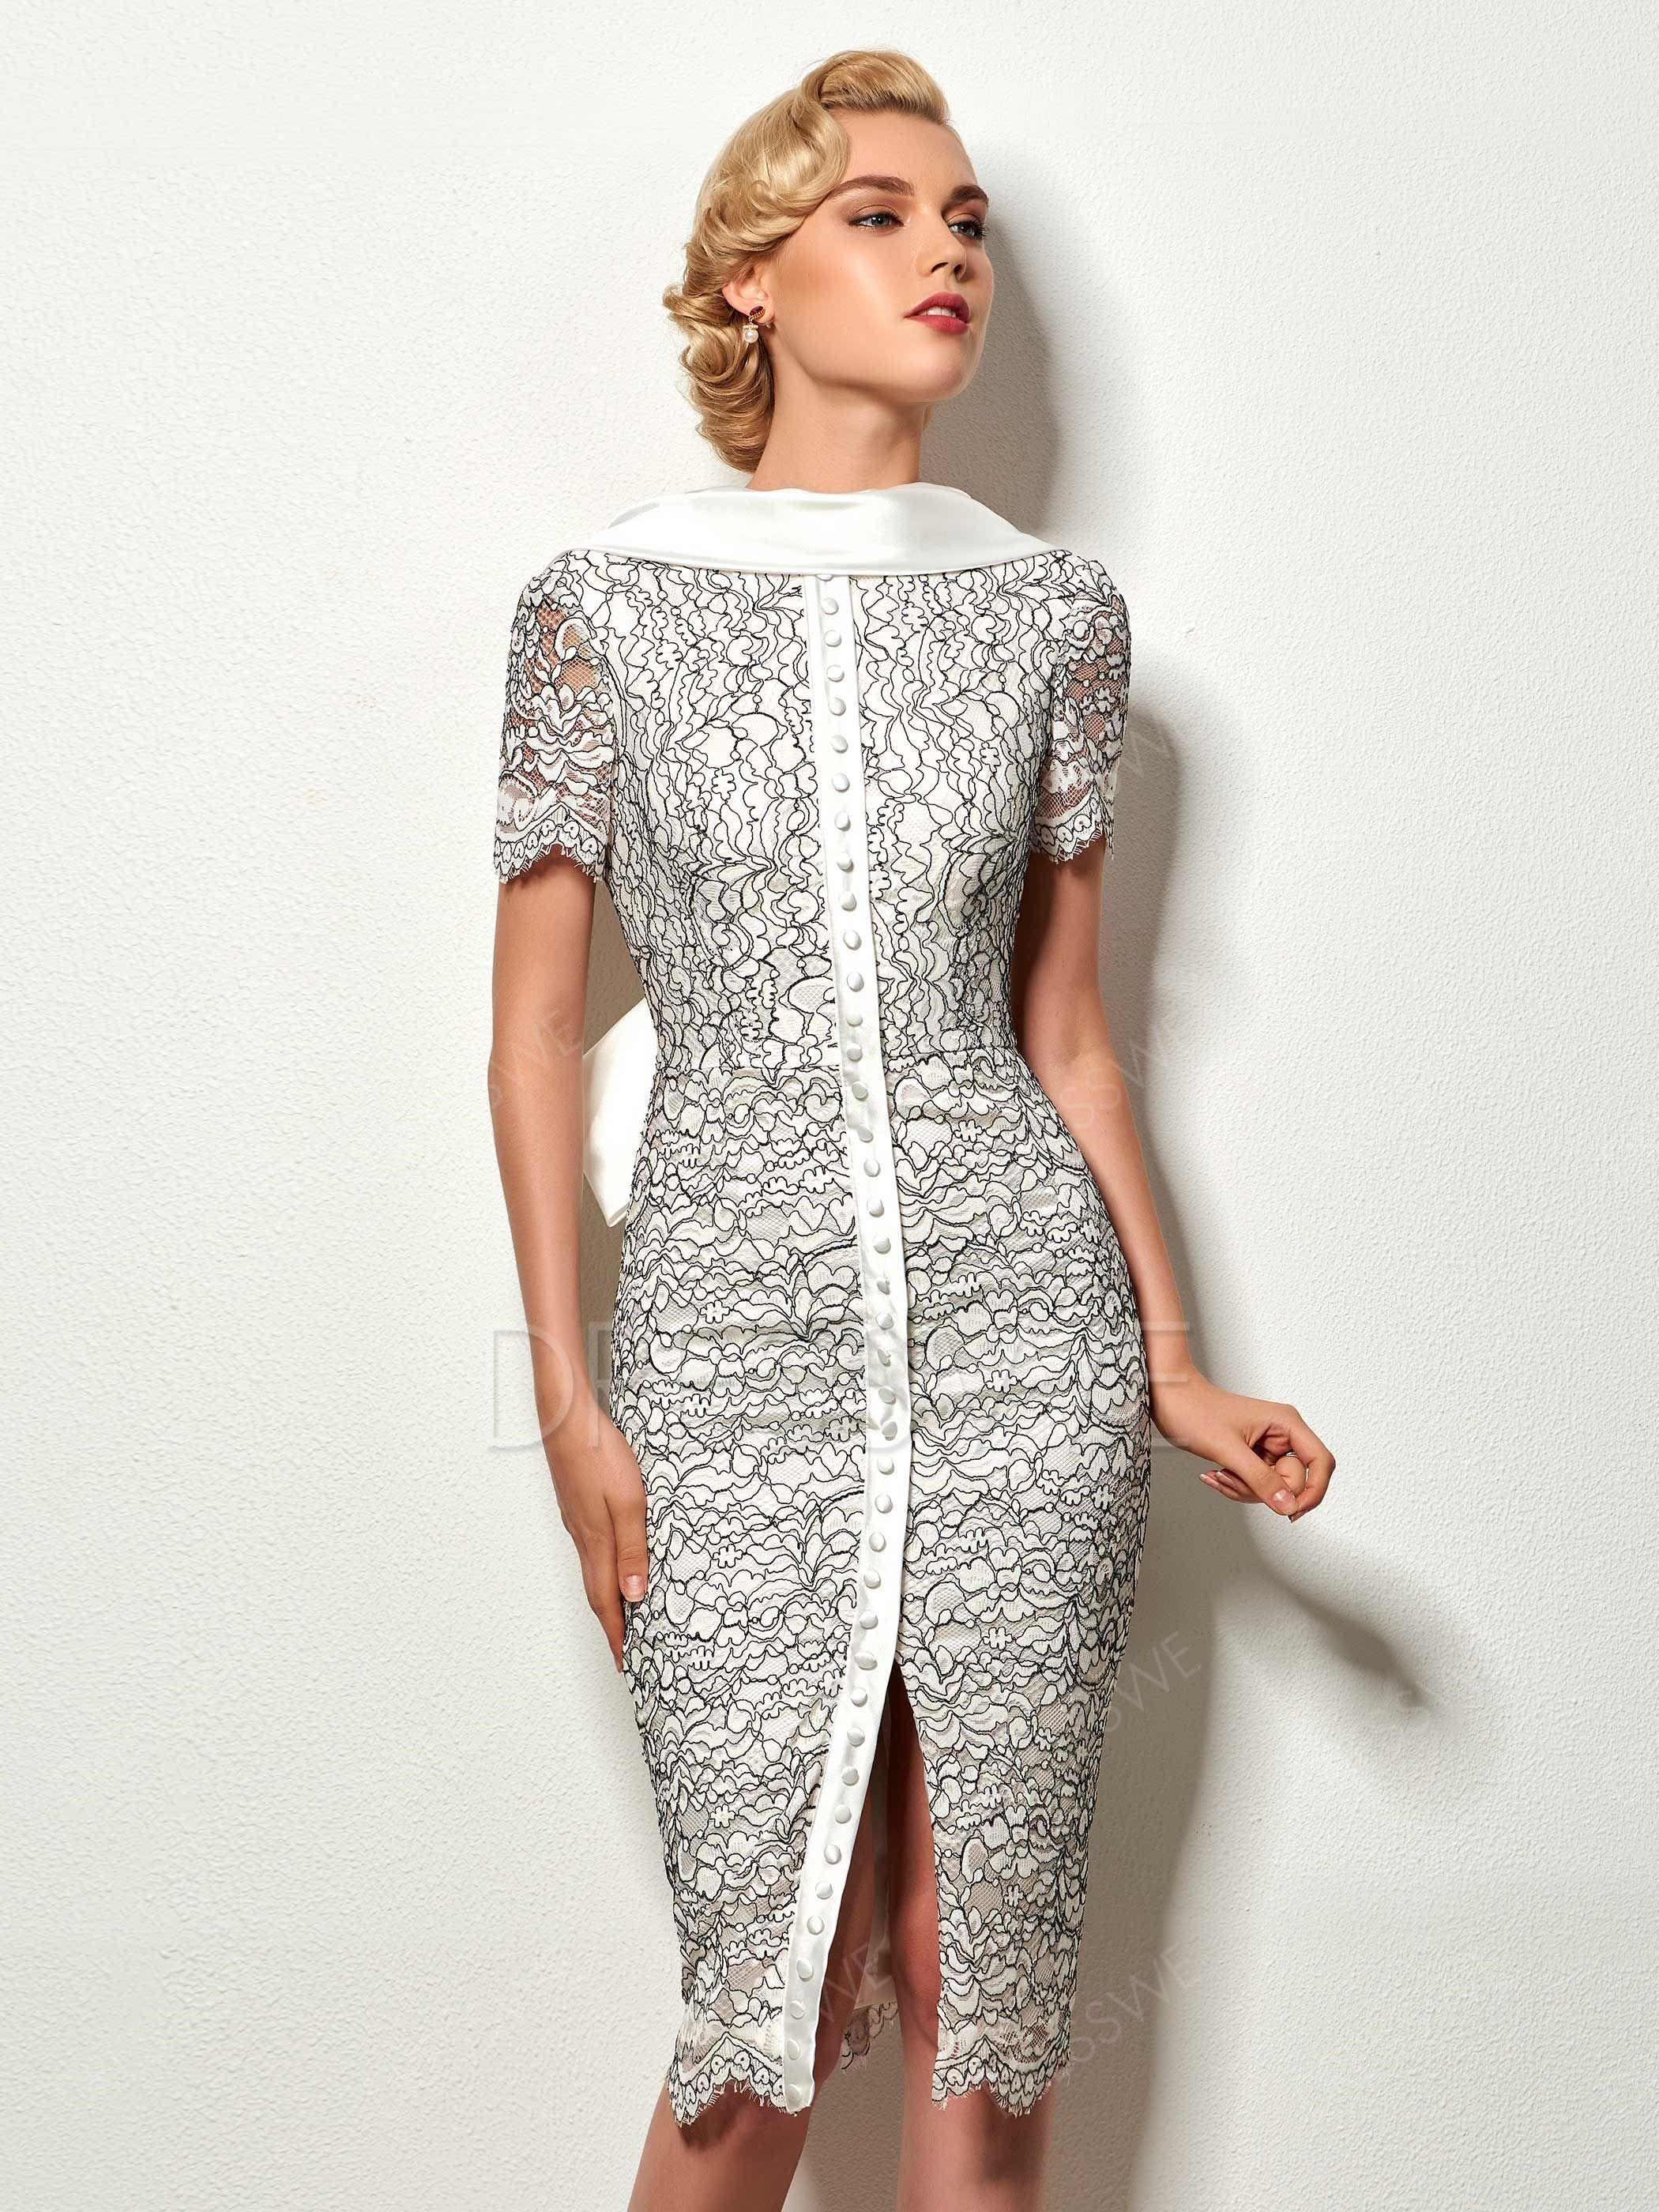 $107.99 Dresswe.com SUPPLIES Vintage Sheath Short Sleeve Deep Back Knee Length Cocktail Dress #backlesscocktaildress